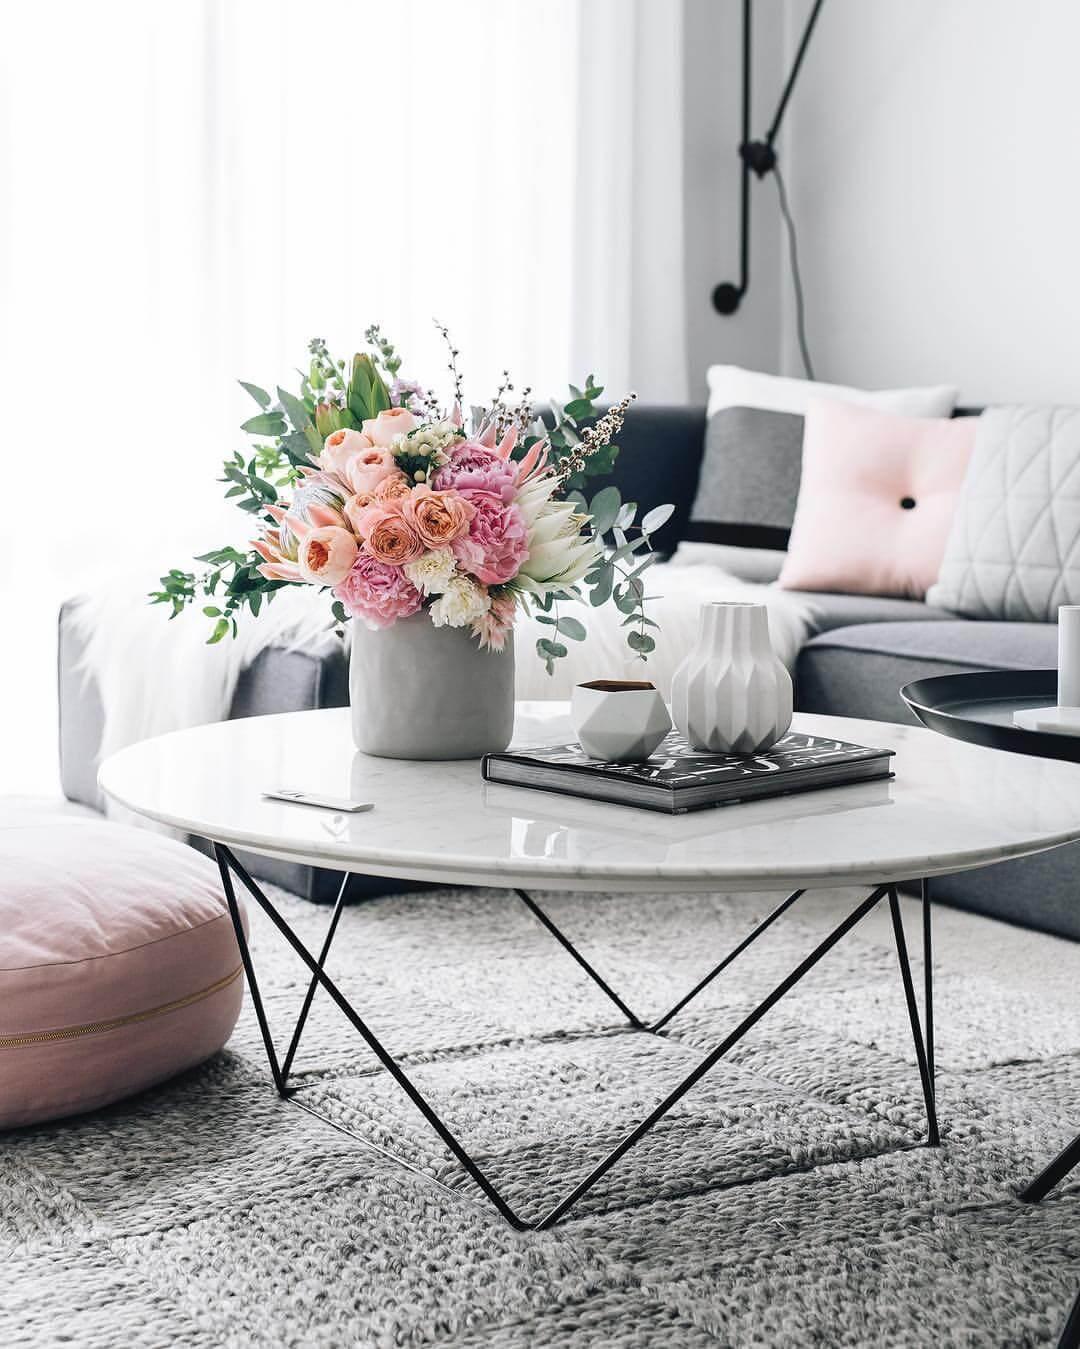 Peachy Spring Flower Arrangement with Geometric Vases